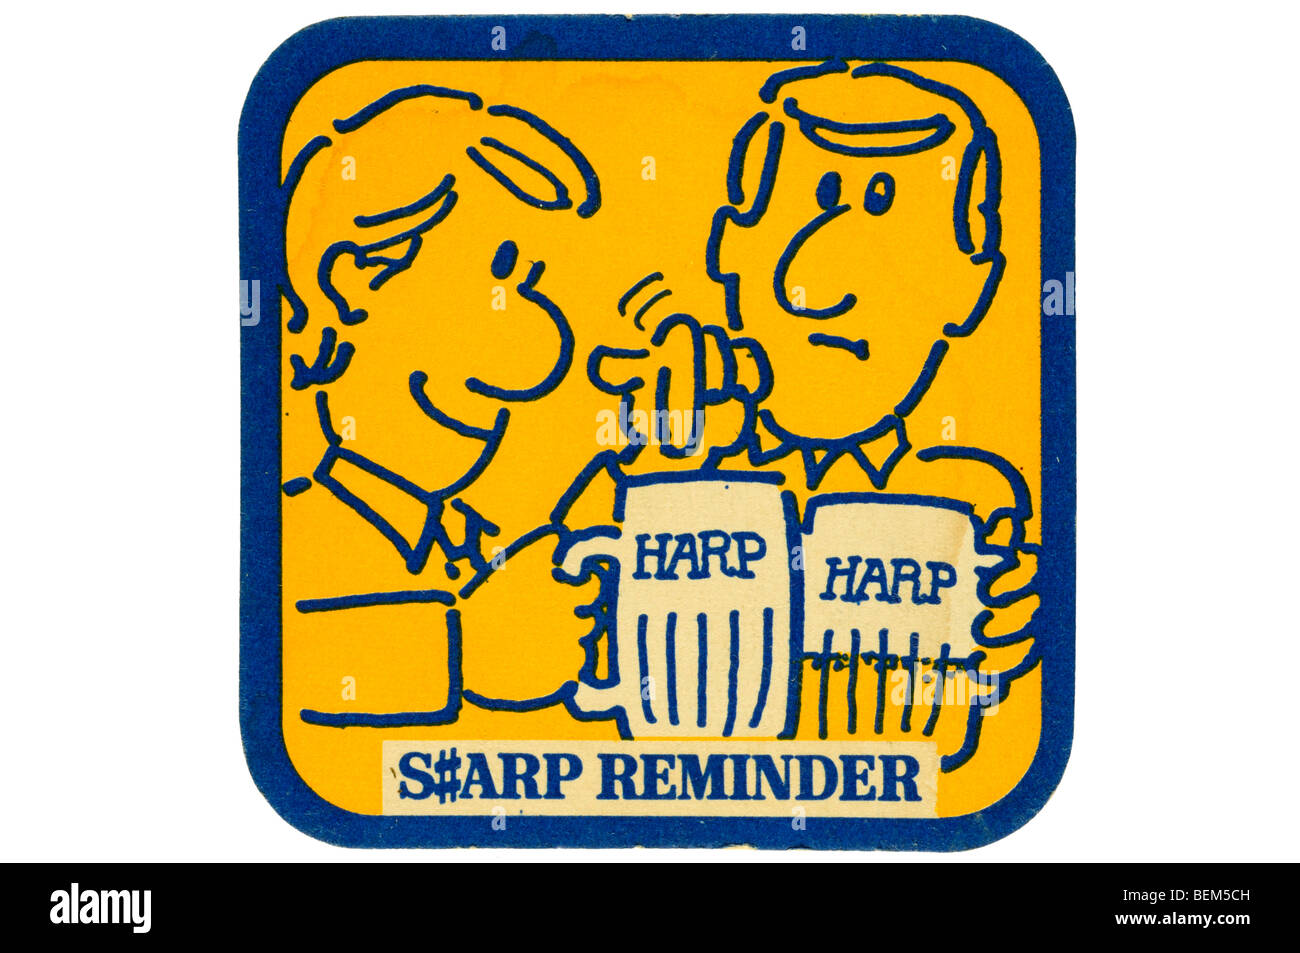 harp s#arp reminder - Stock Image